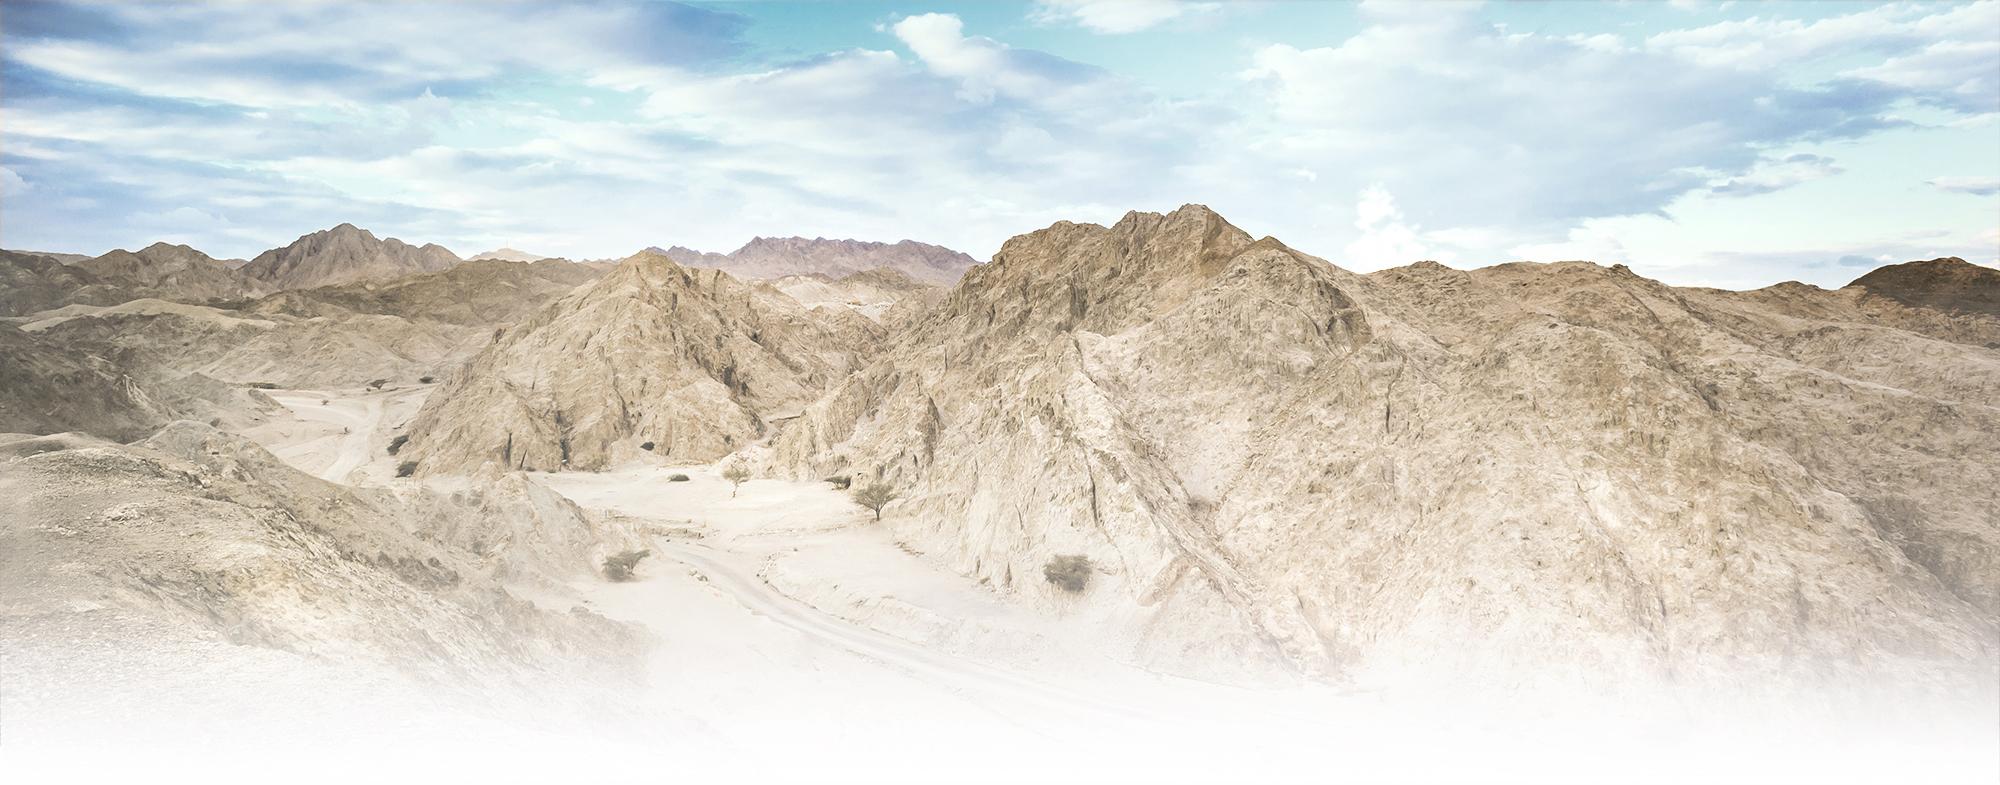 epiqr Immobilien Berglandschaft